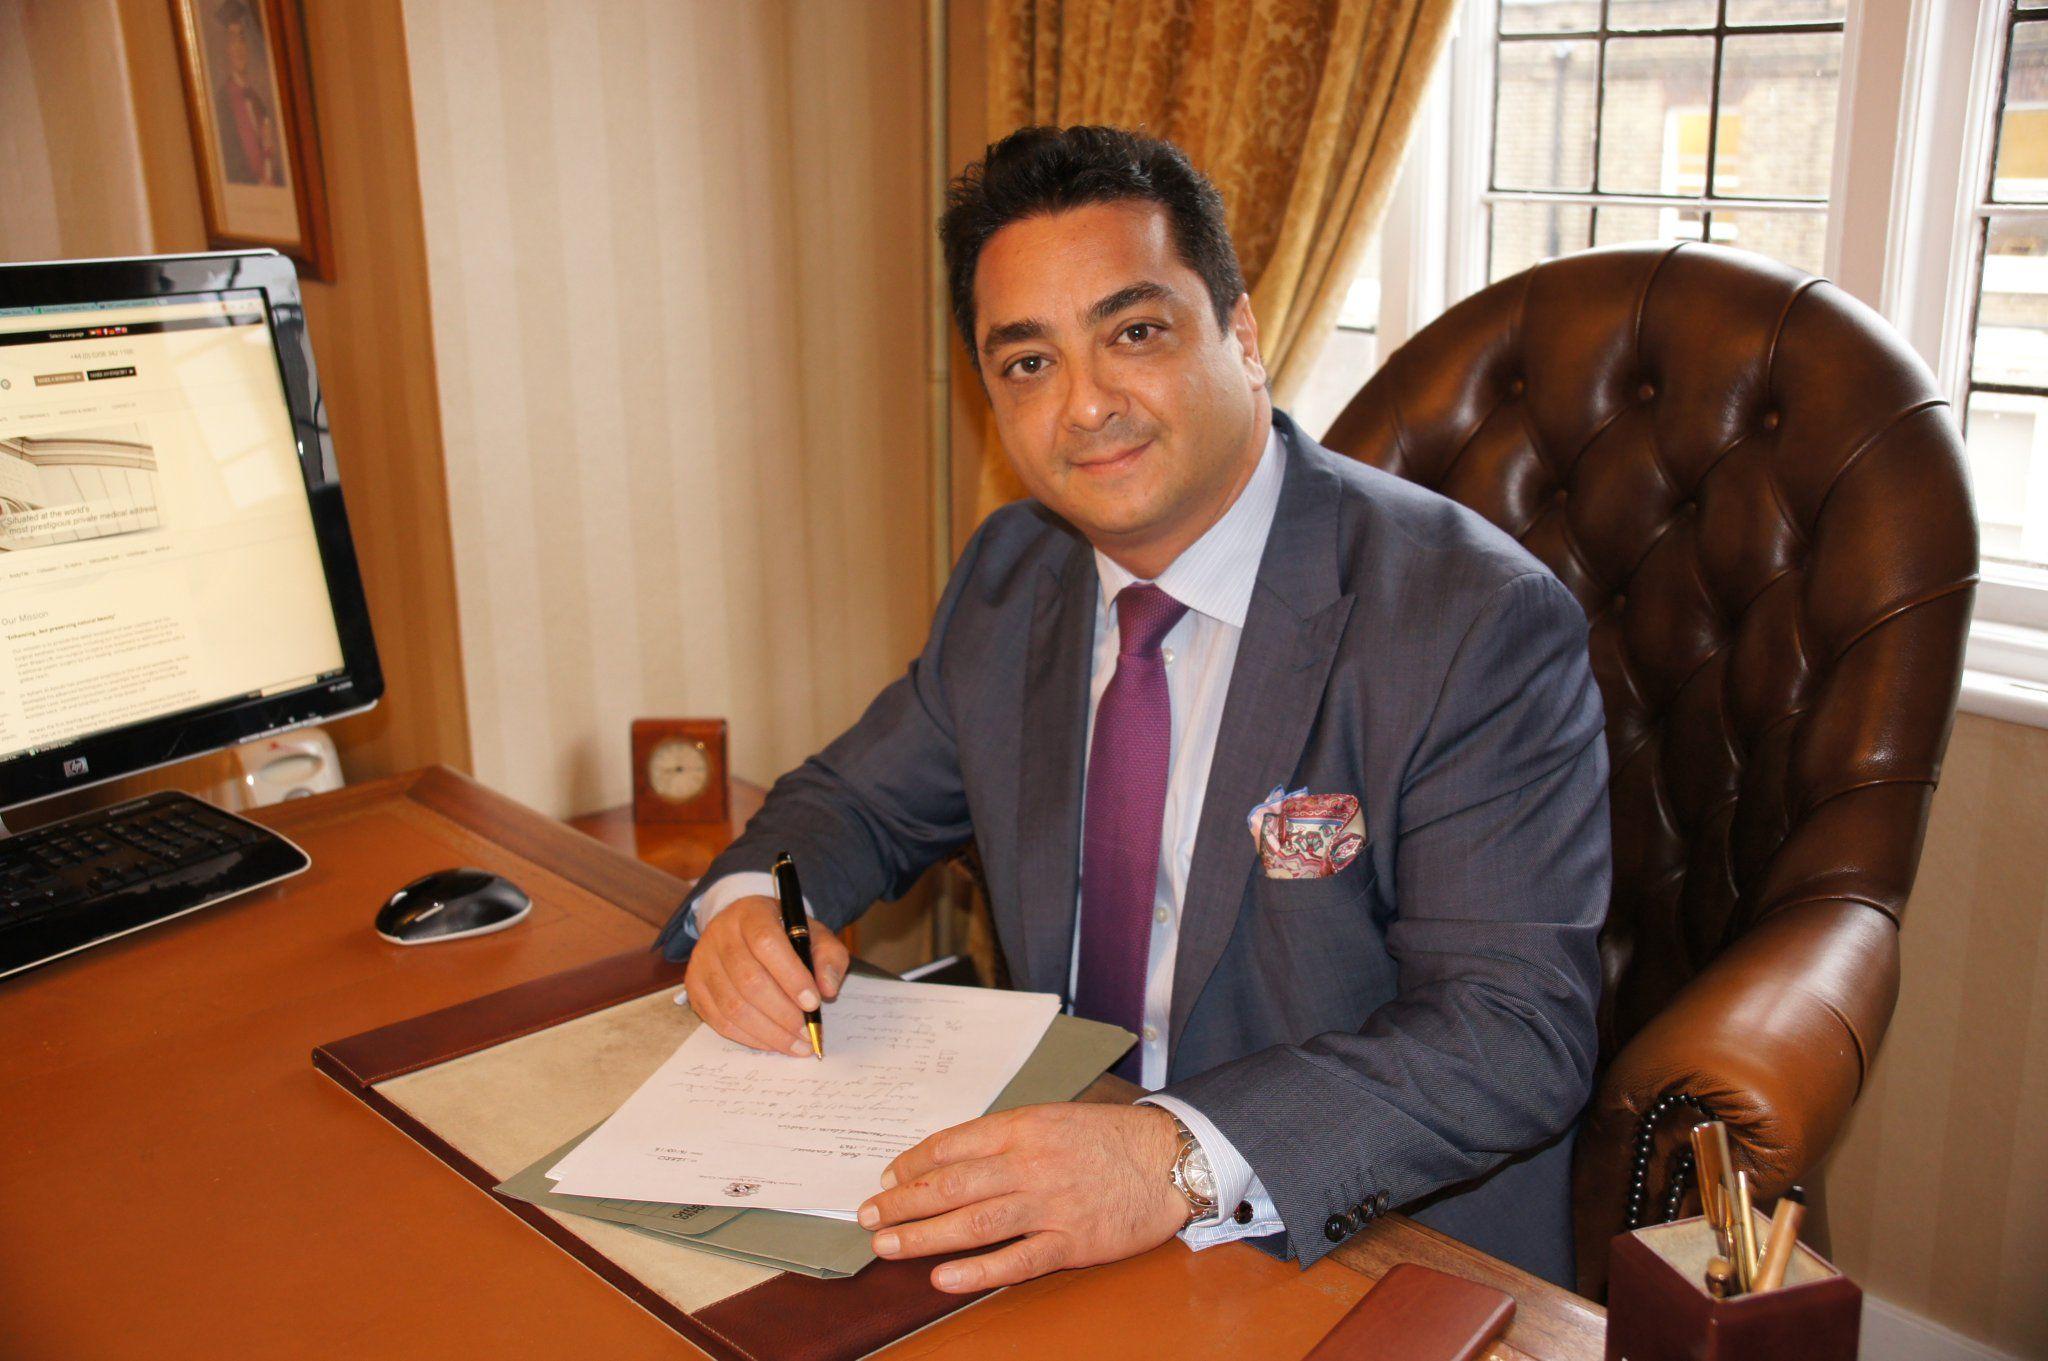 Dr Ayham Al-Ayoubi